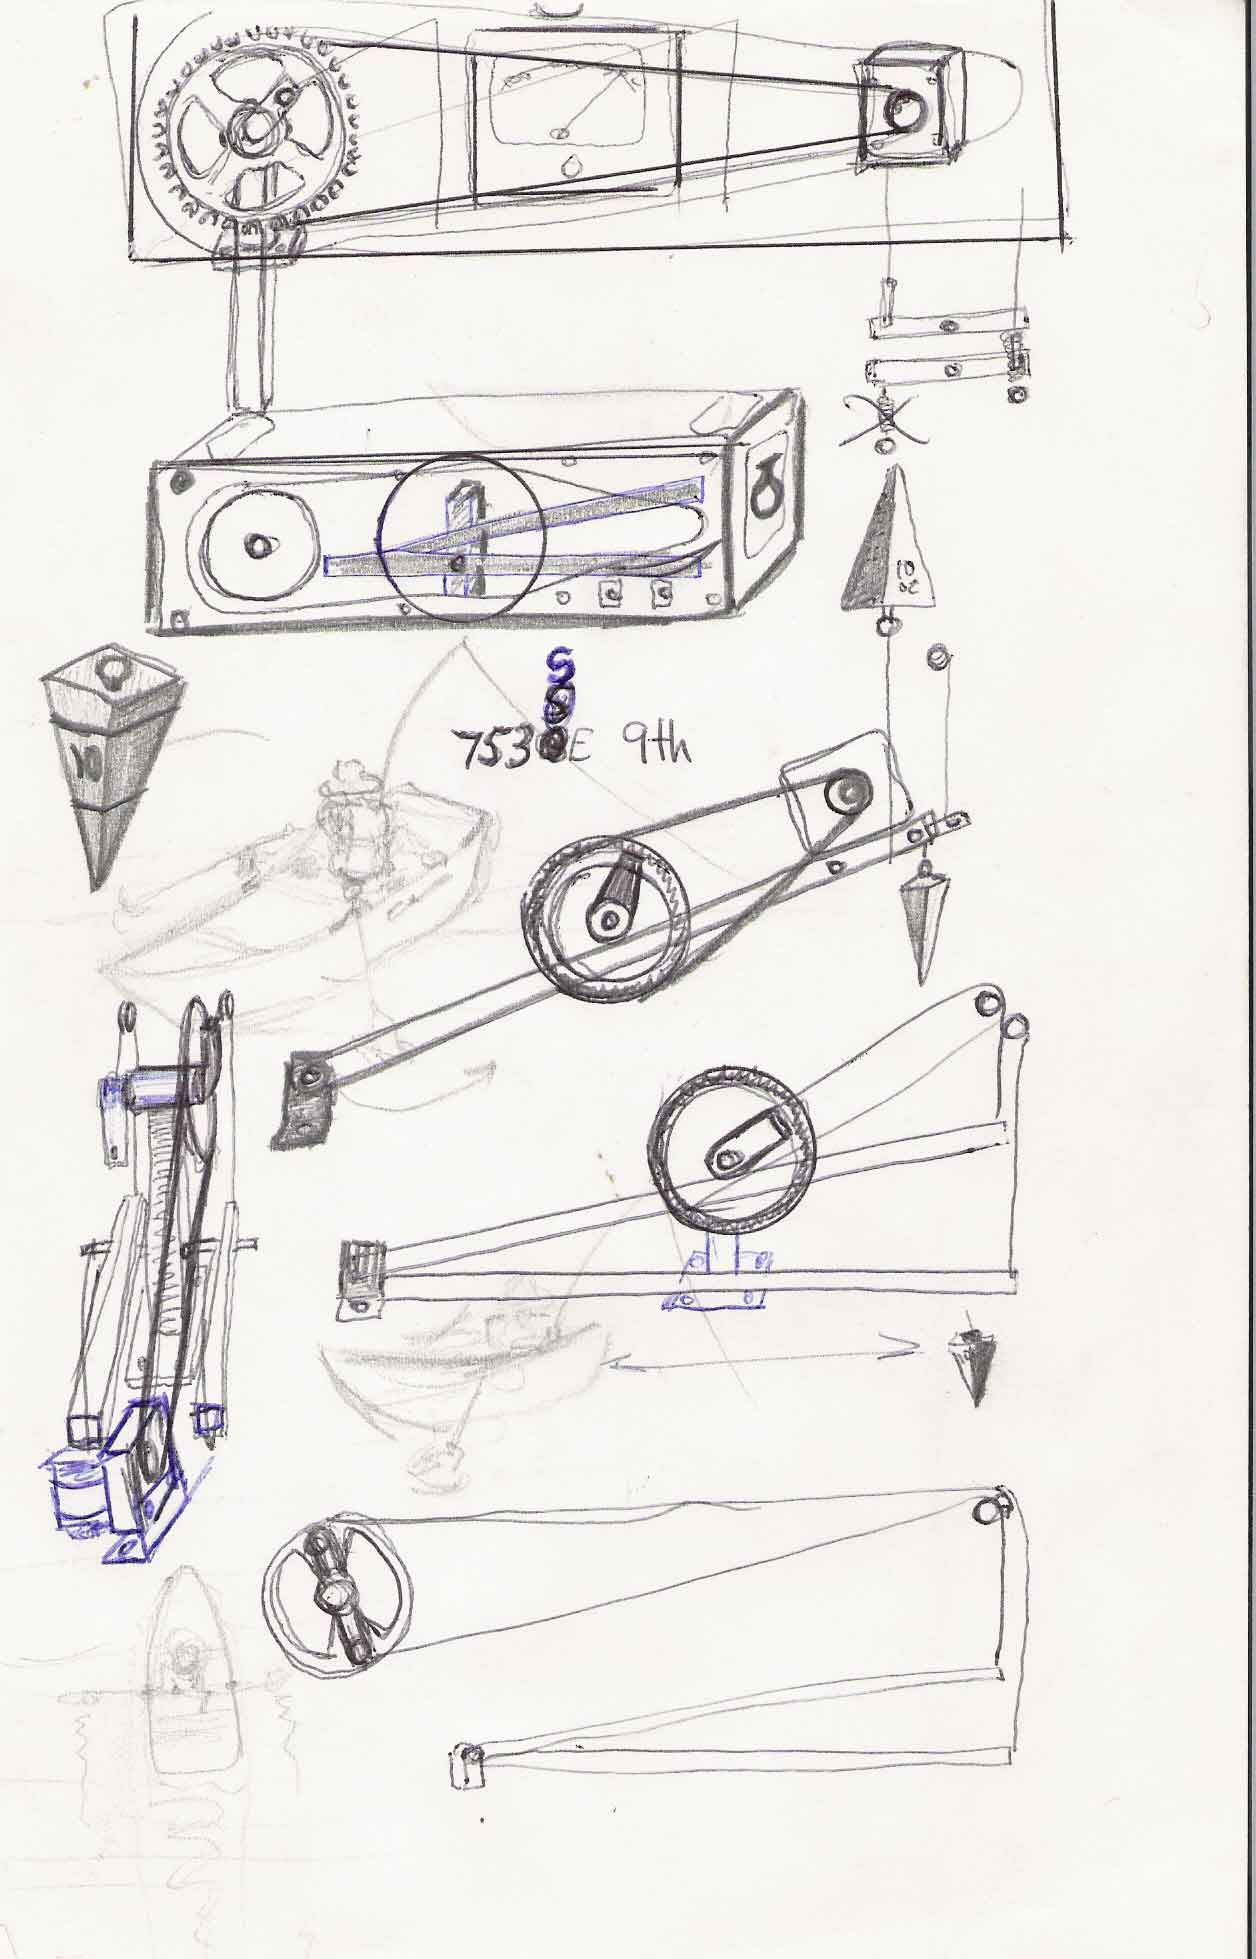 sketch-11-sept-05.jpg